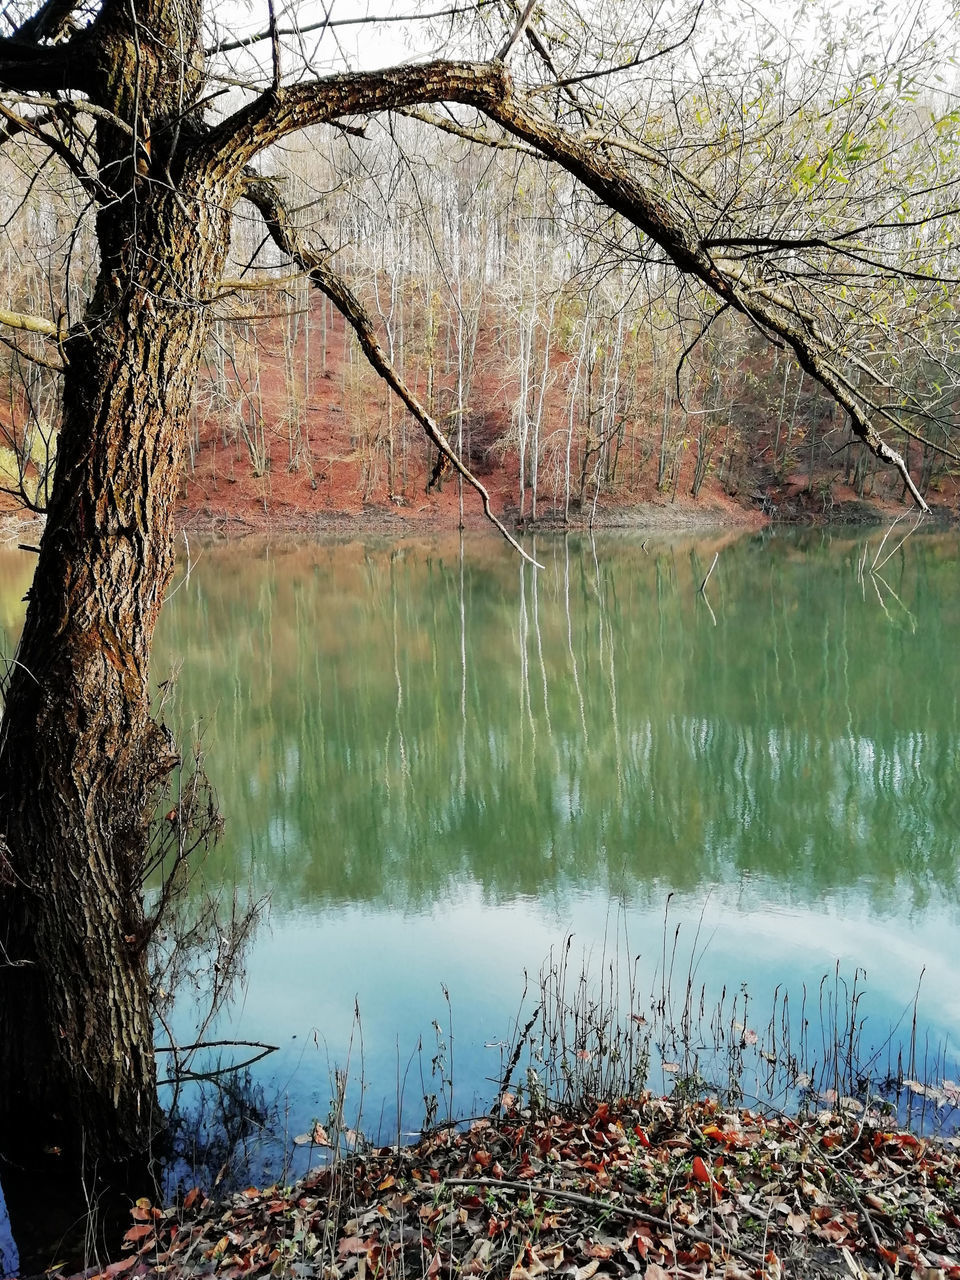 REFLECTION OF TREES ON LAKE